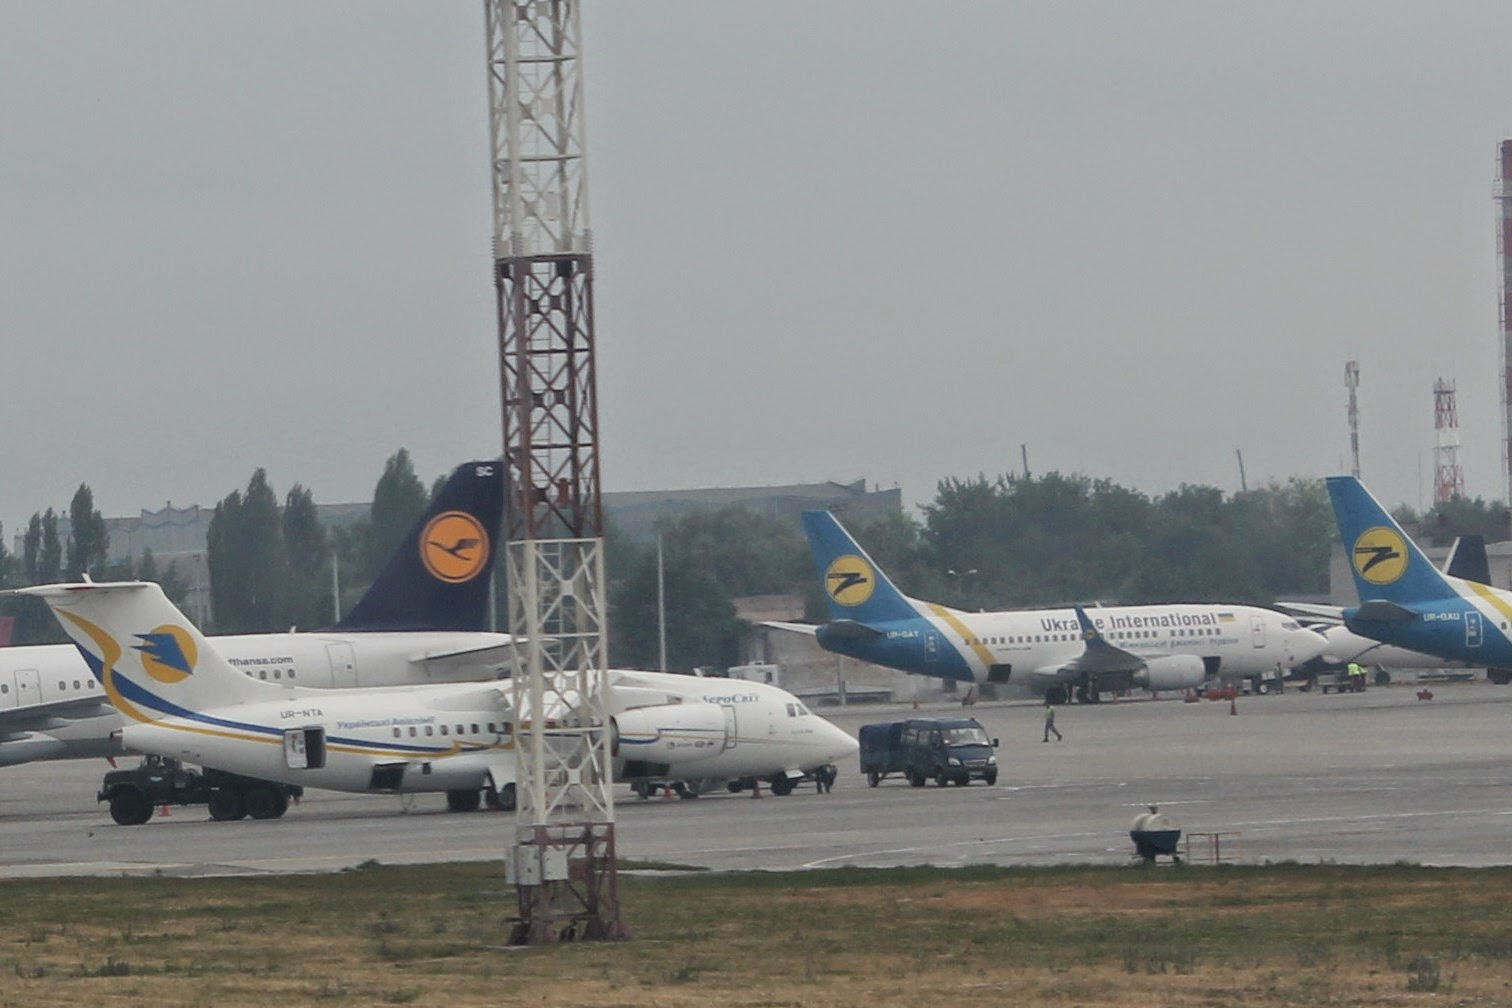 Kiev Airport Lufthansa Ukraine Airlines Aerosvit